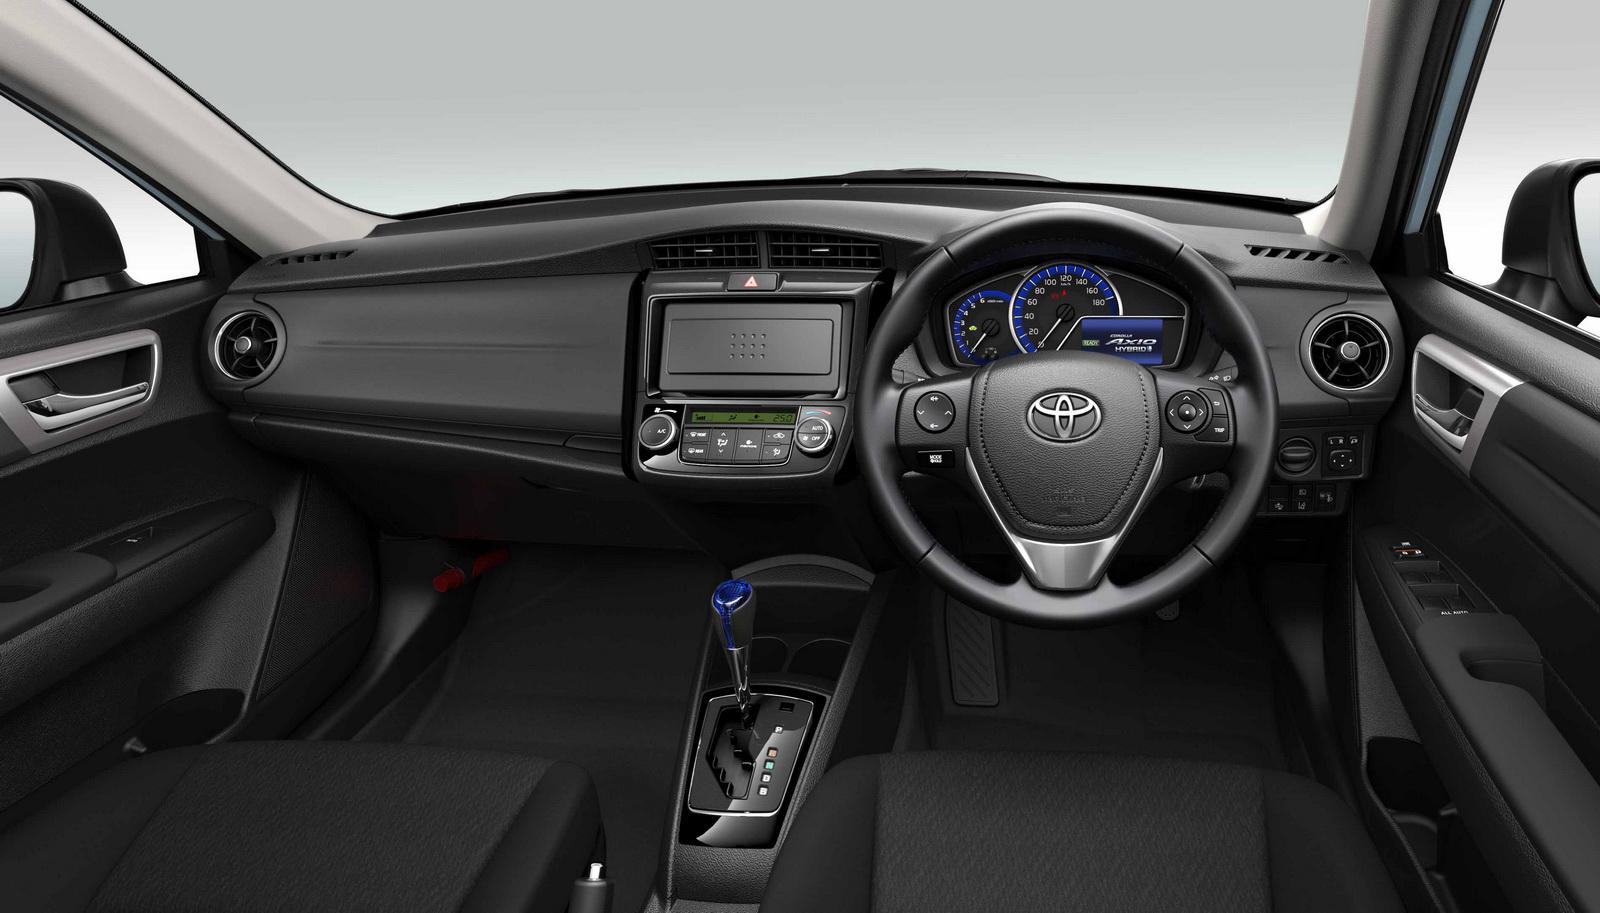 Toyota เปิดตัวการแต่งสไตล์ Jdm ของรถแบบ Corolla Fielder